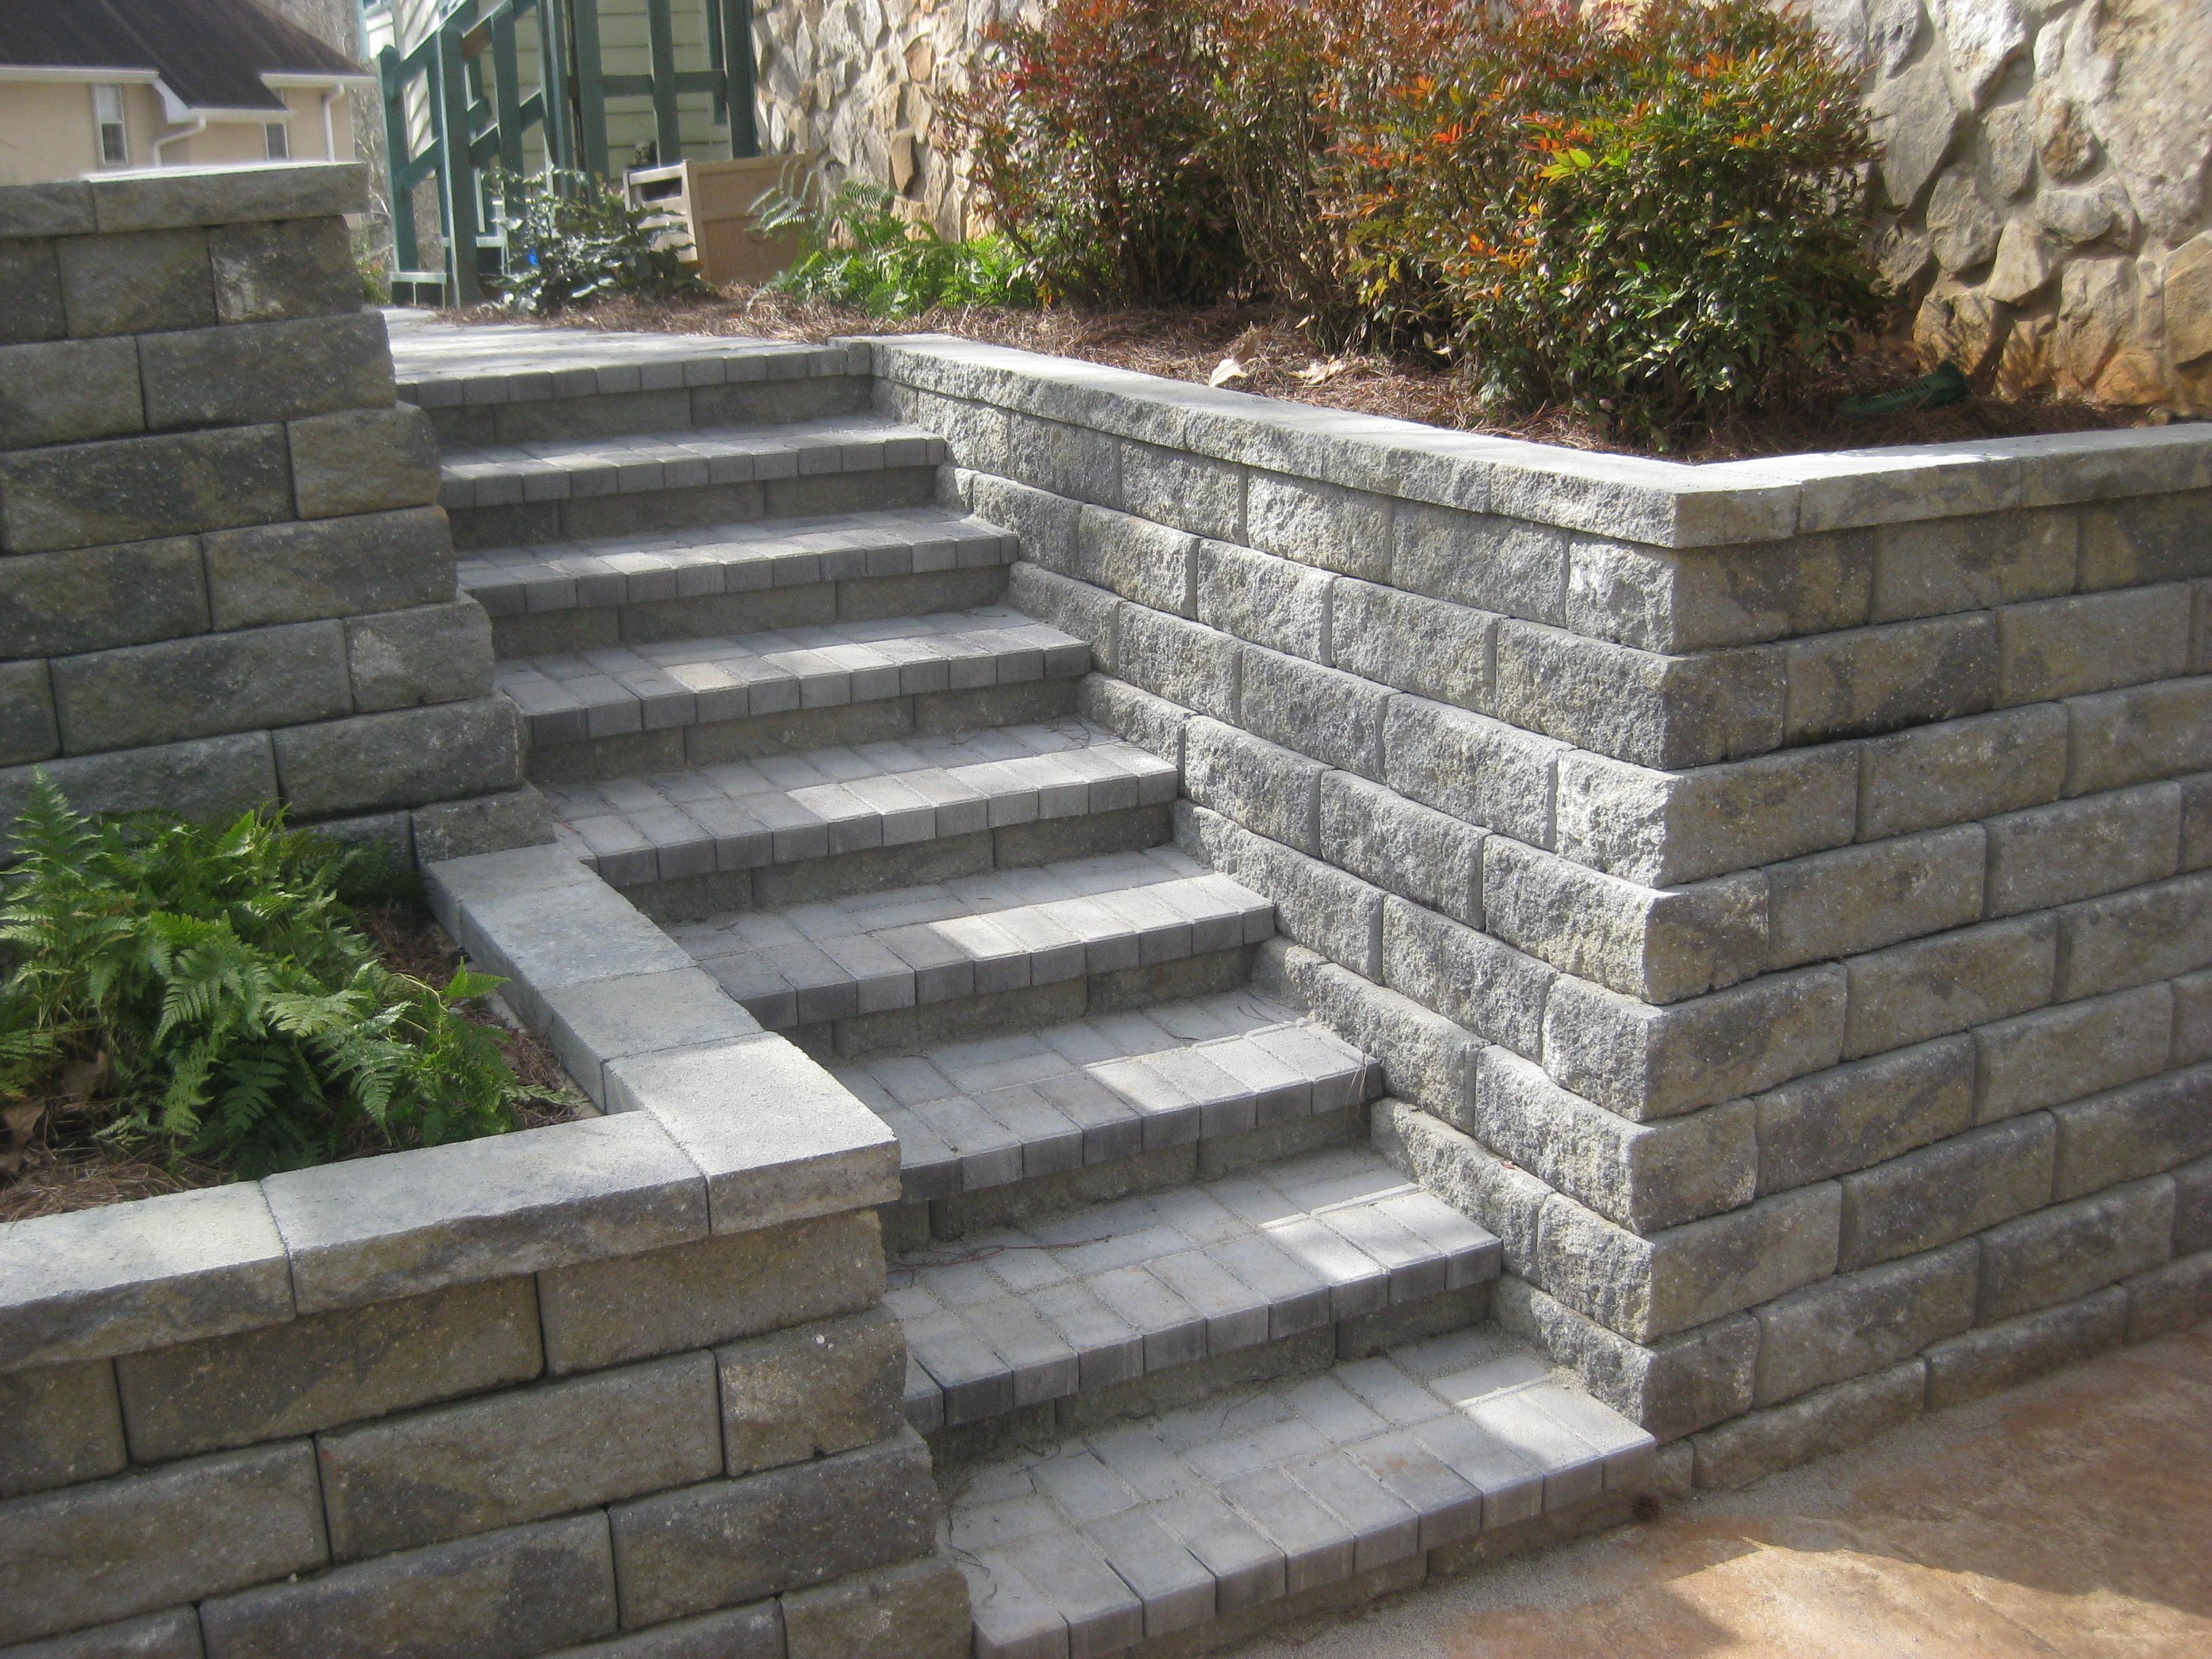 Fantastic Landscape Steps - McPlants - pavers stone timbers wood II71